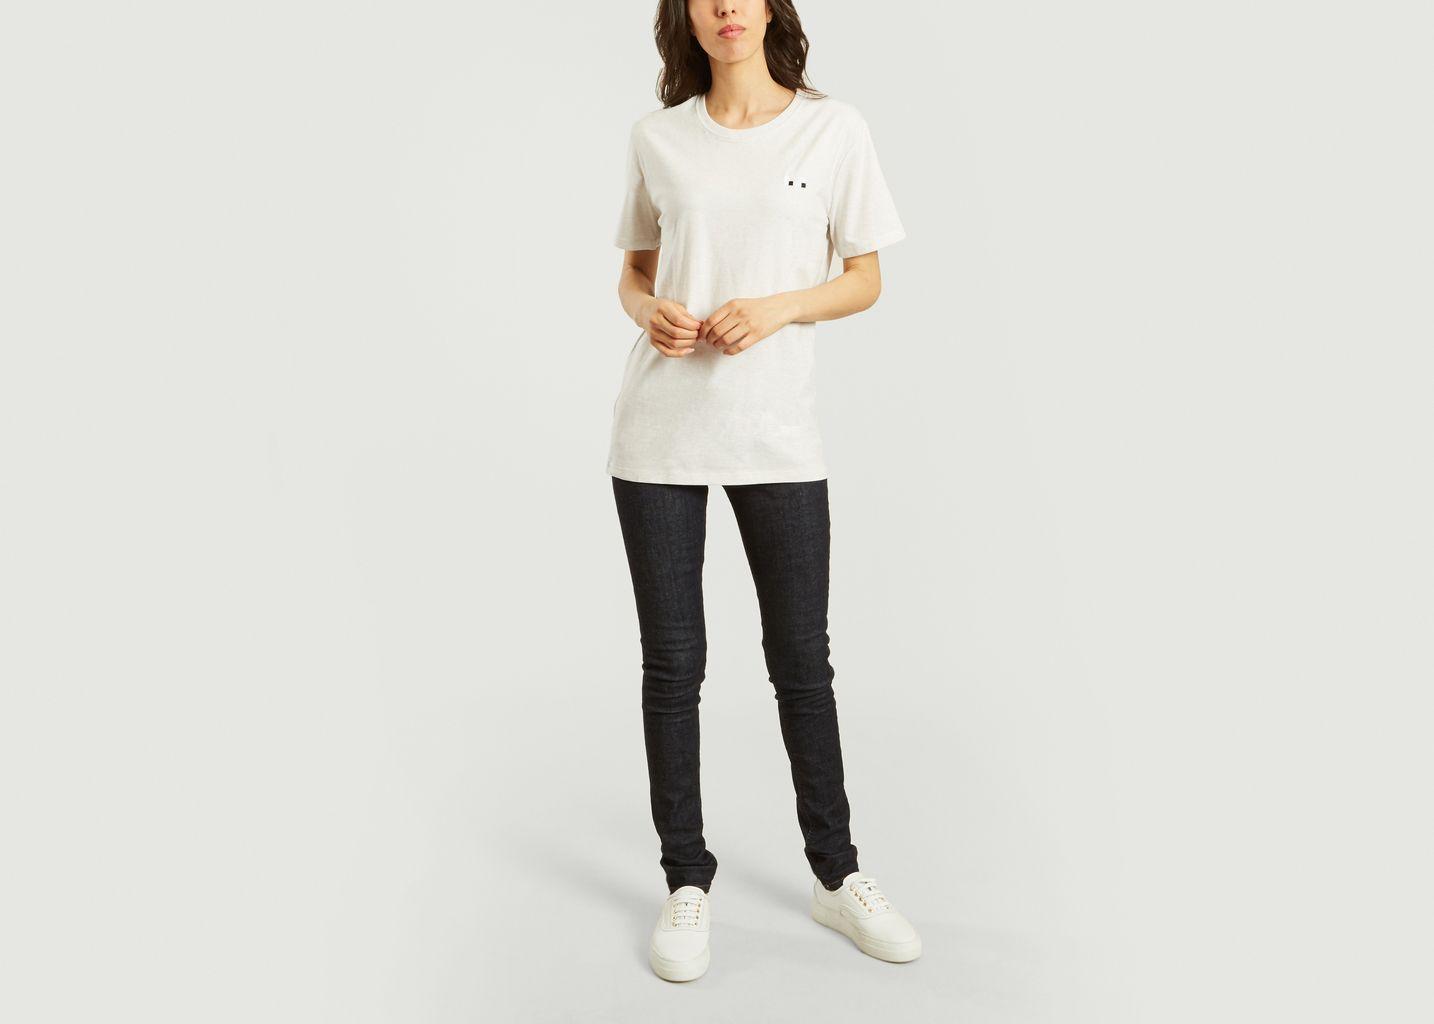 T-Shirt Eye - Bricktown World